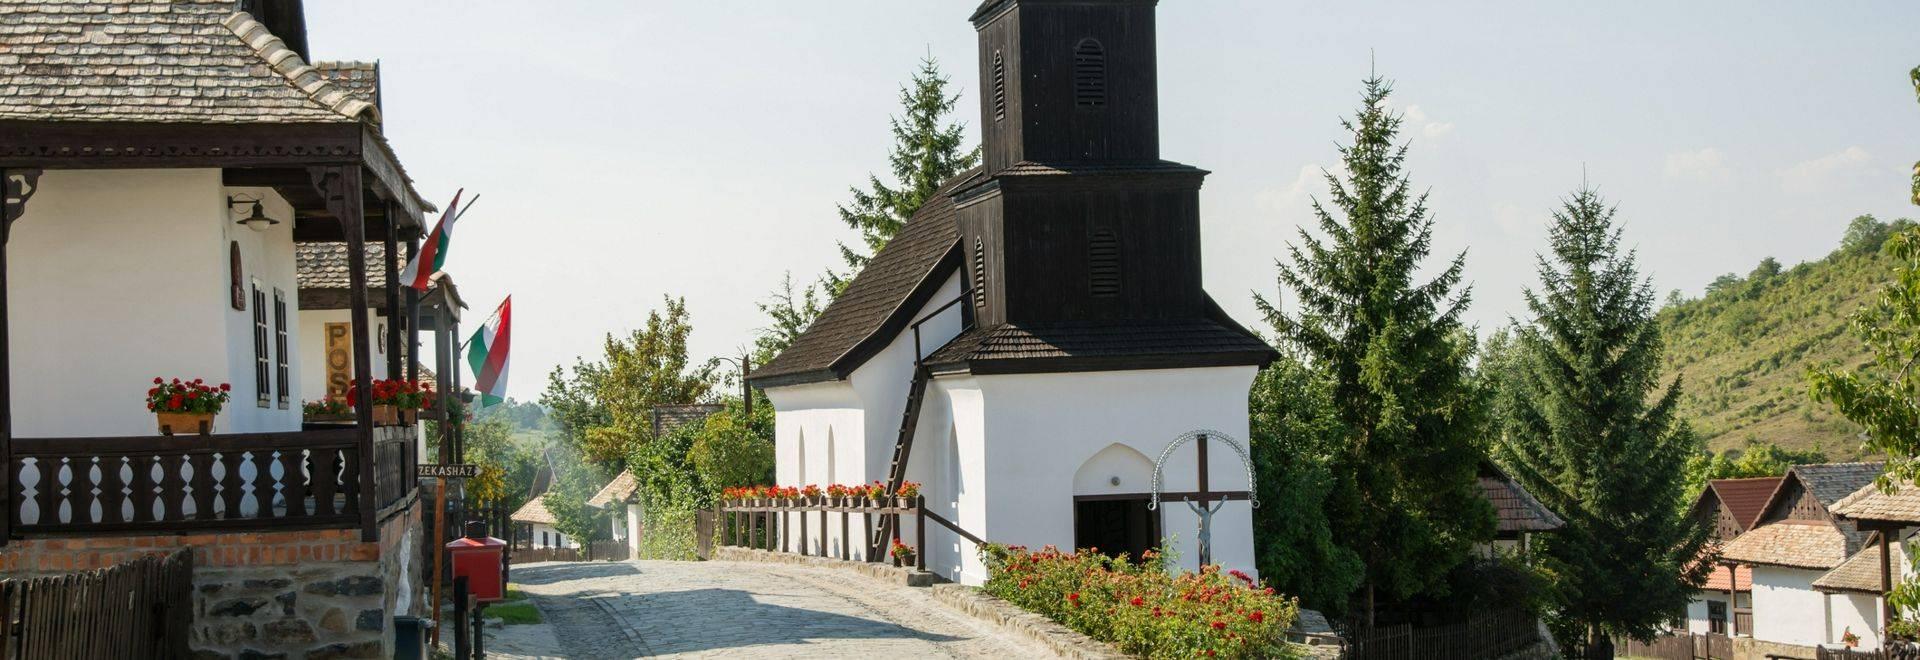 hungary village - Holl?k?